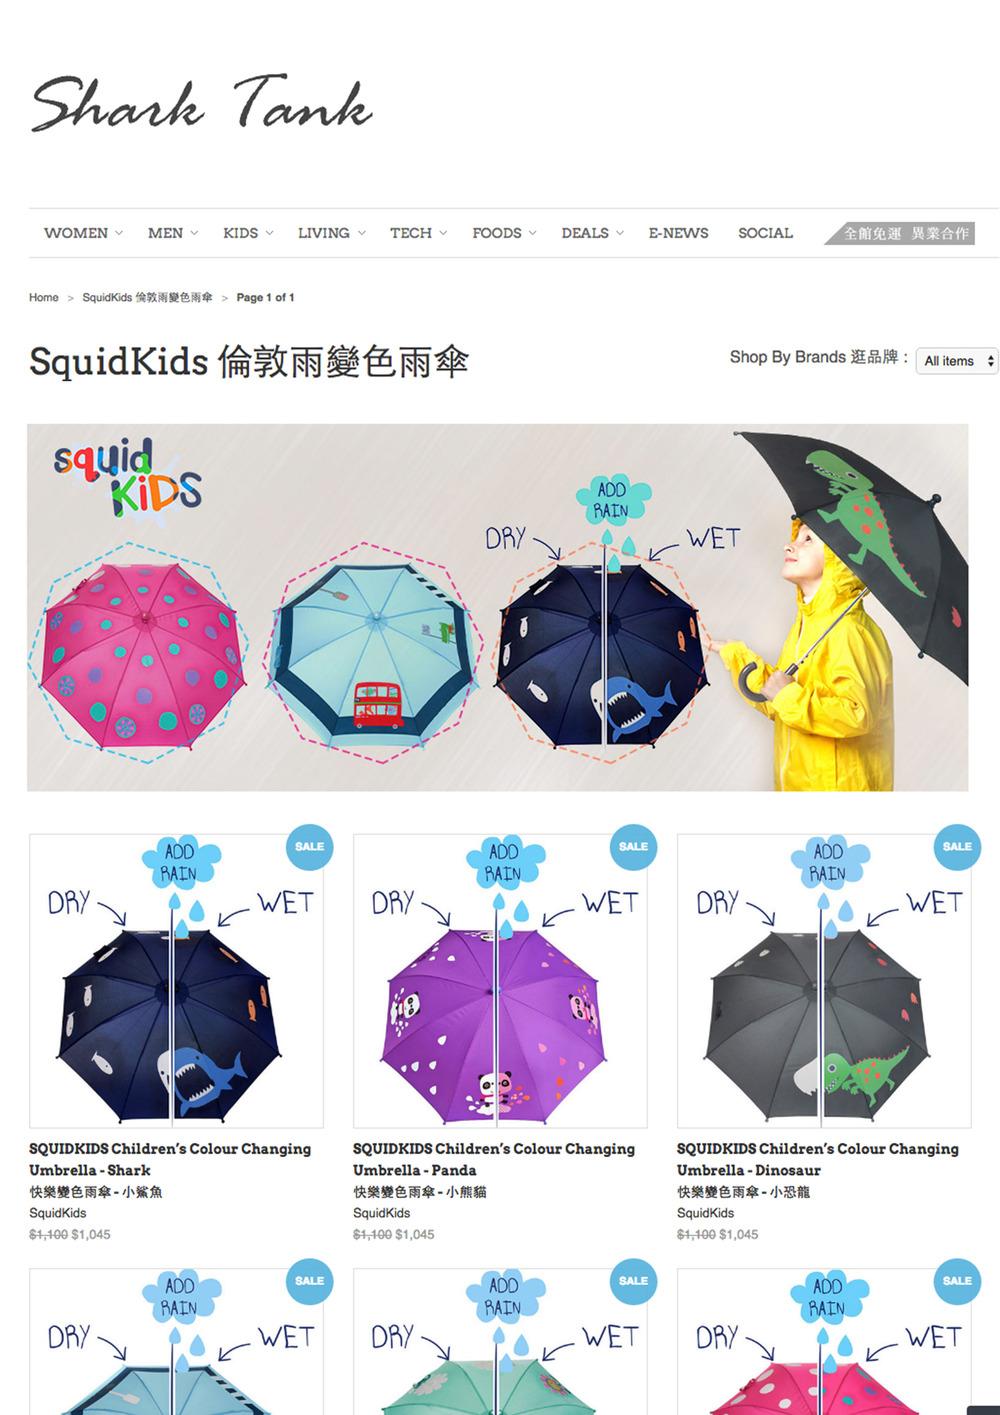 May 2016 SquidKids